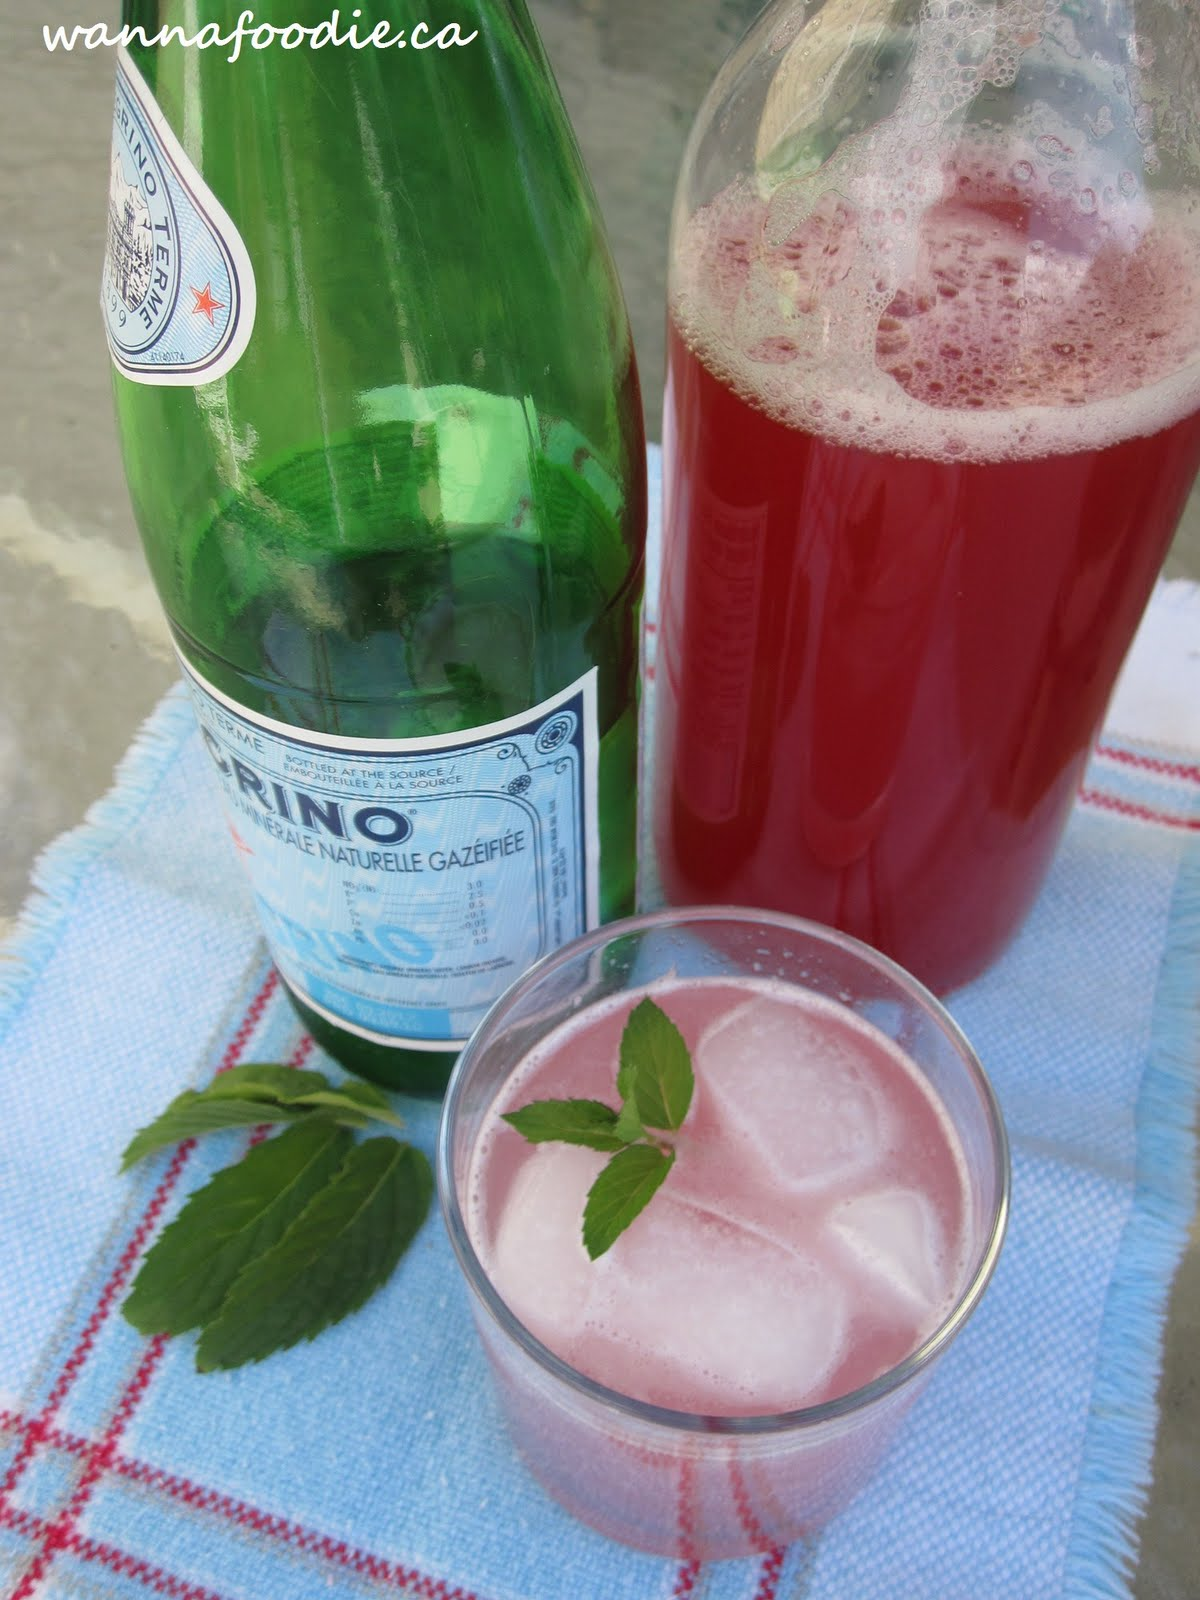 wannafoodie.ca: Rhubarb Raspberry Syrup